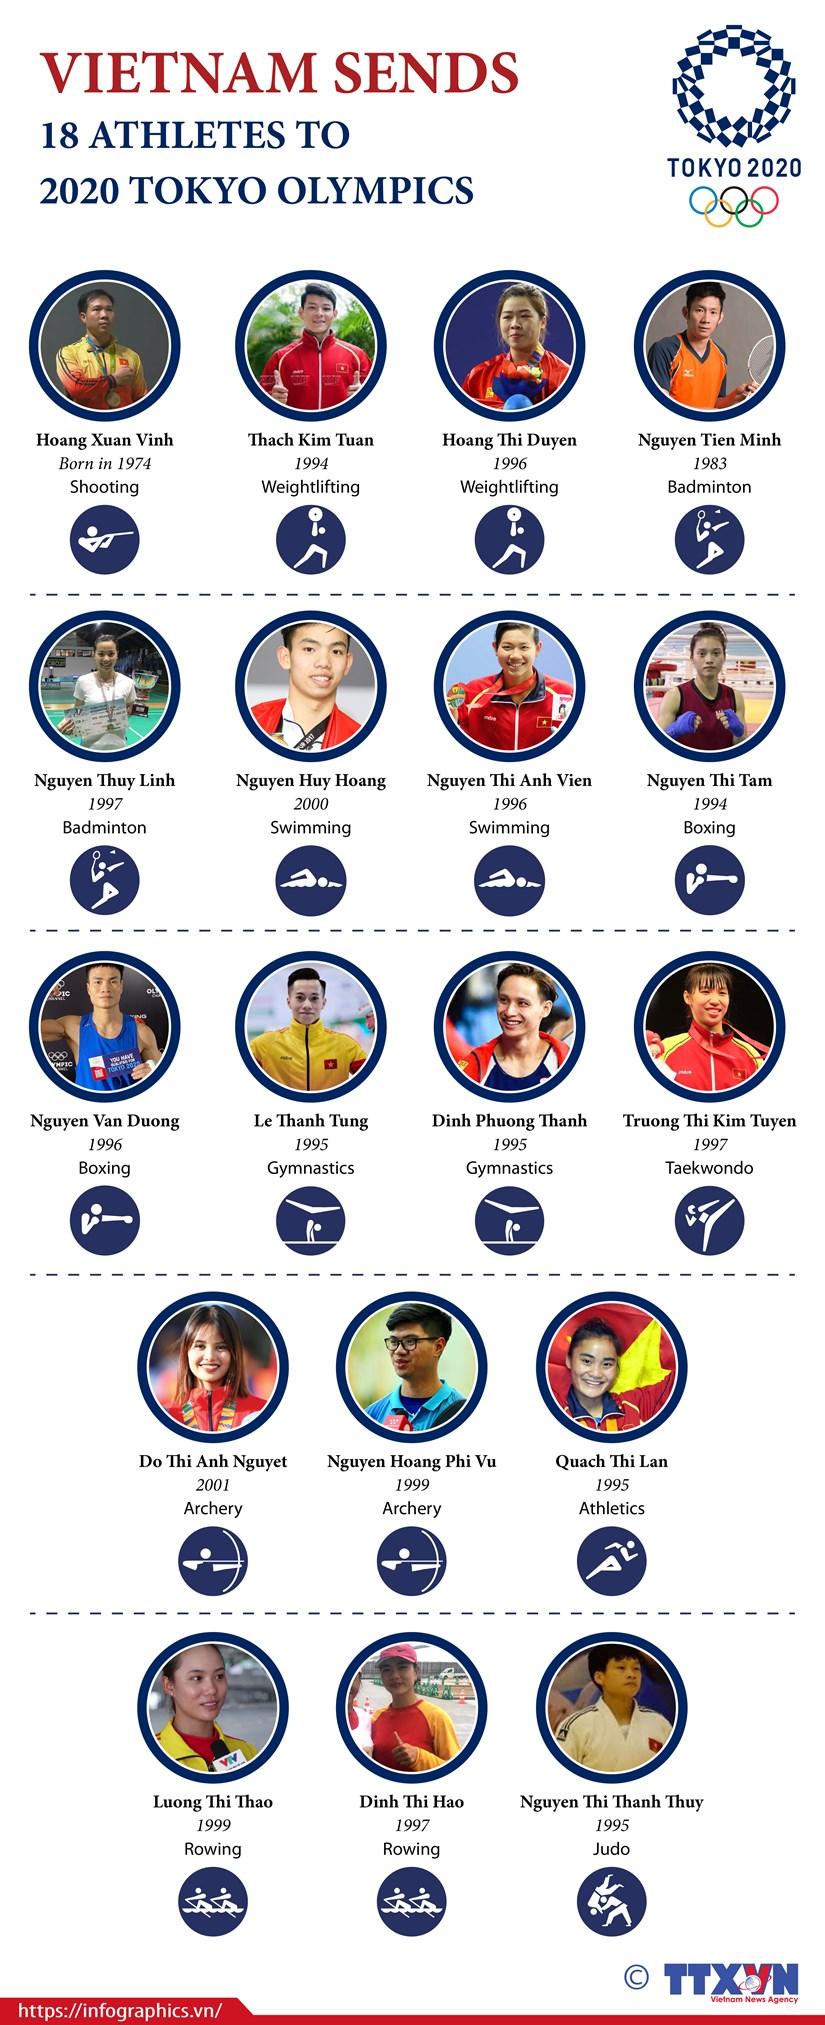 Vietnam sends 18 athletes to 2020 Tokyo Olympics hinh anh 1